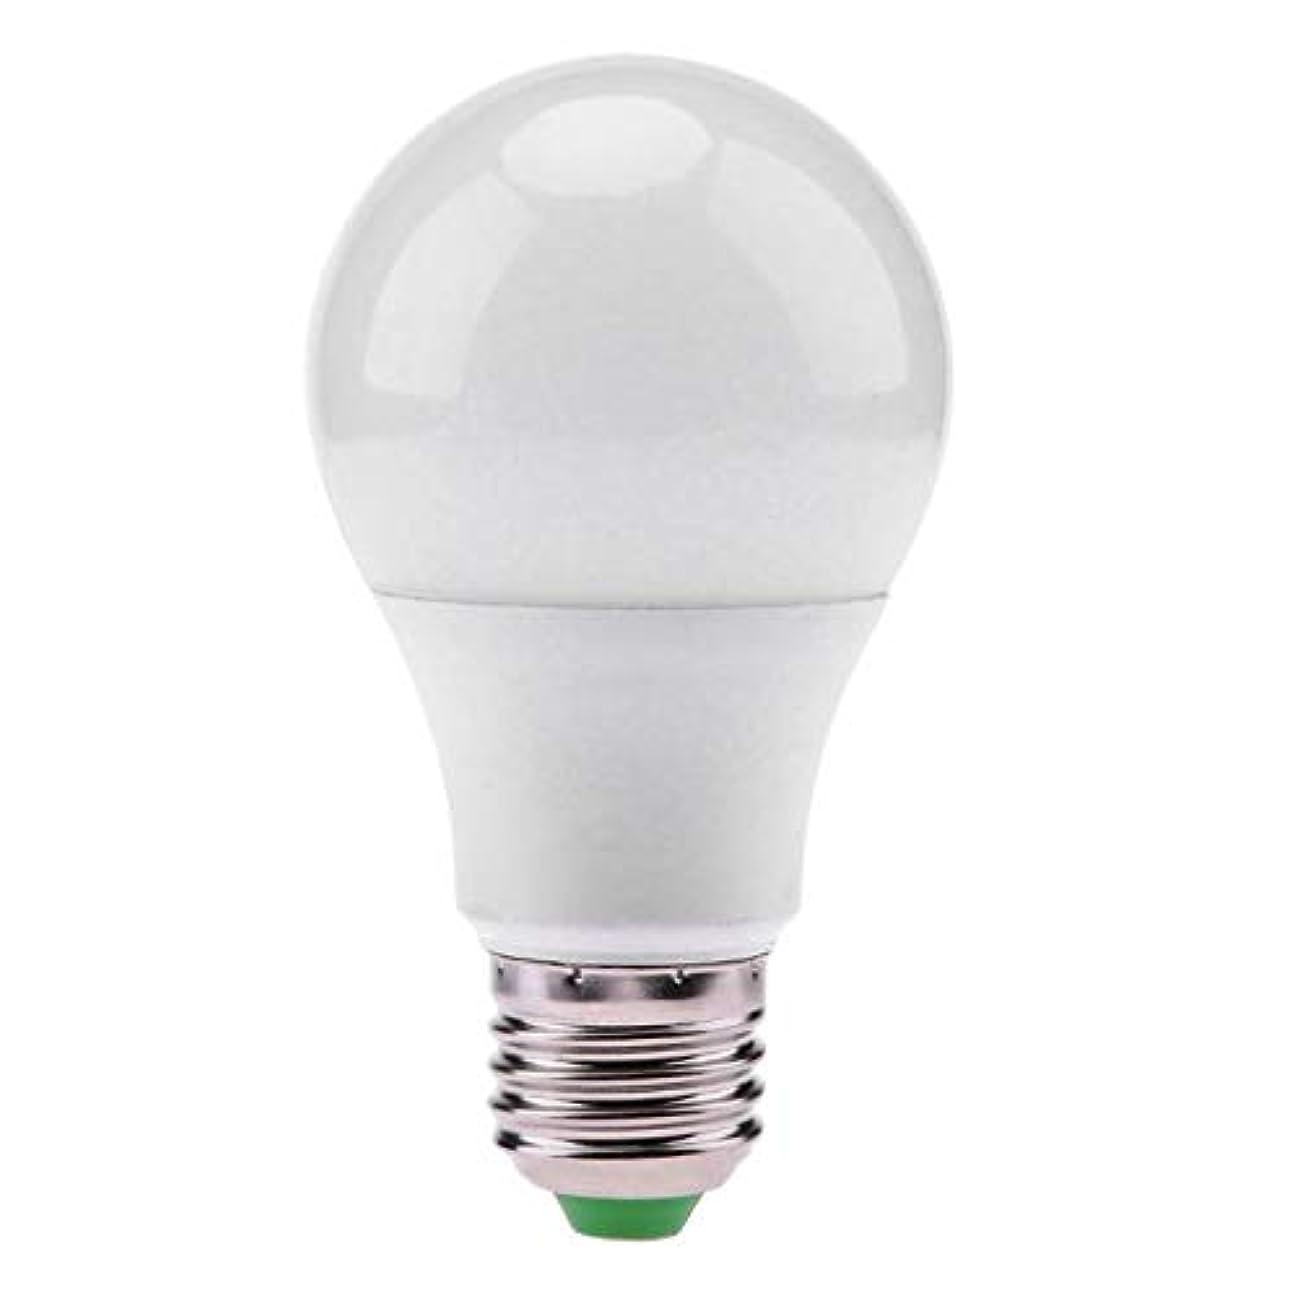 BIN BON - E27 9W 16 Colors RGB LED Bulb Lamp 220V LED Light 21 Keys Infrared Remote Control Corridor Light for Living Room